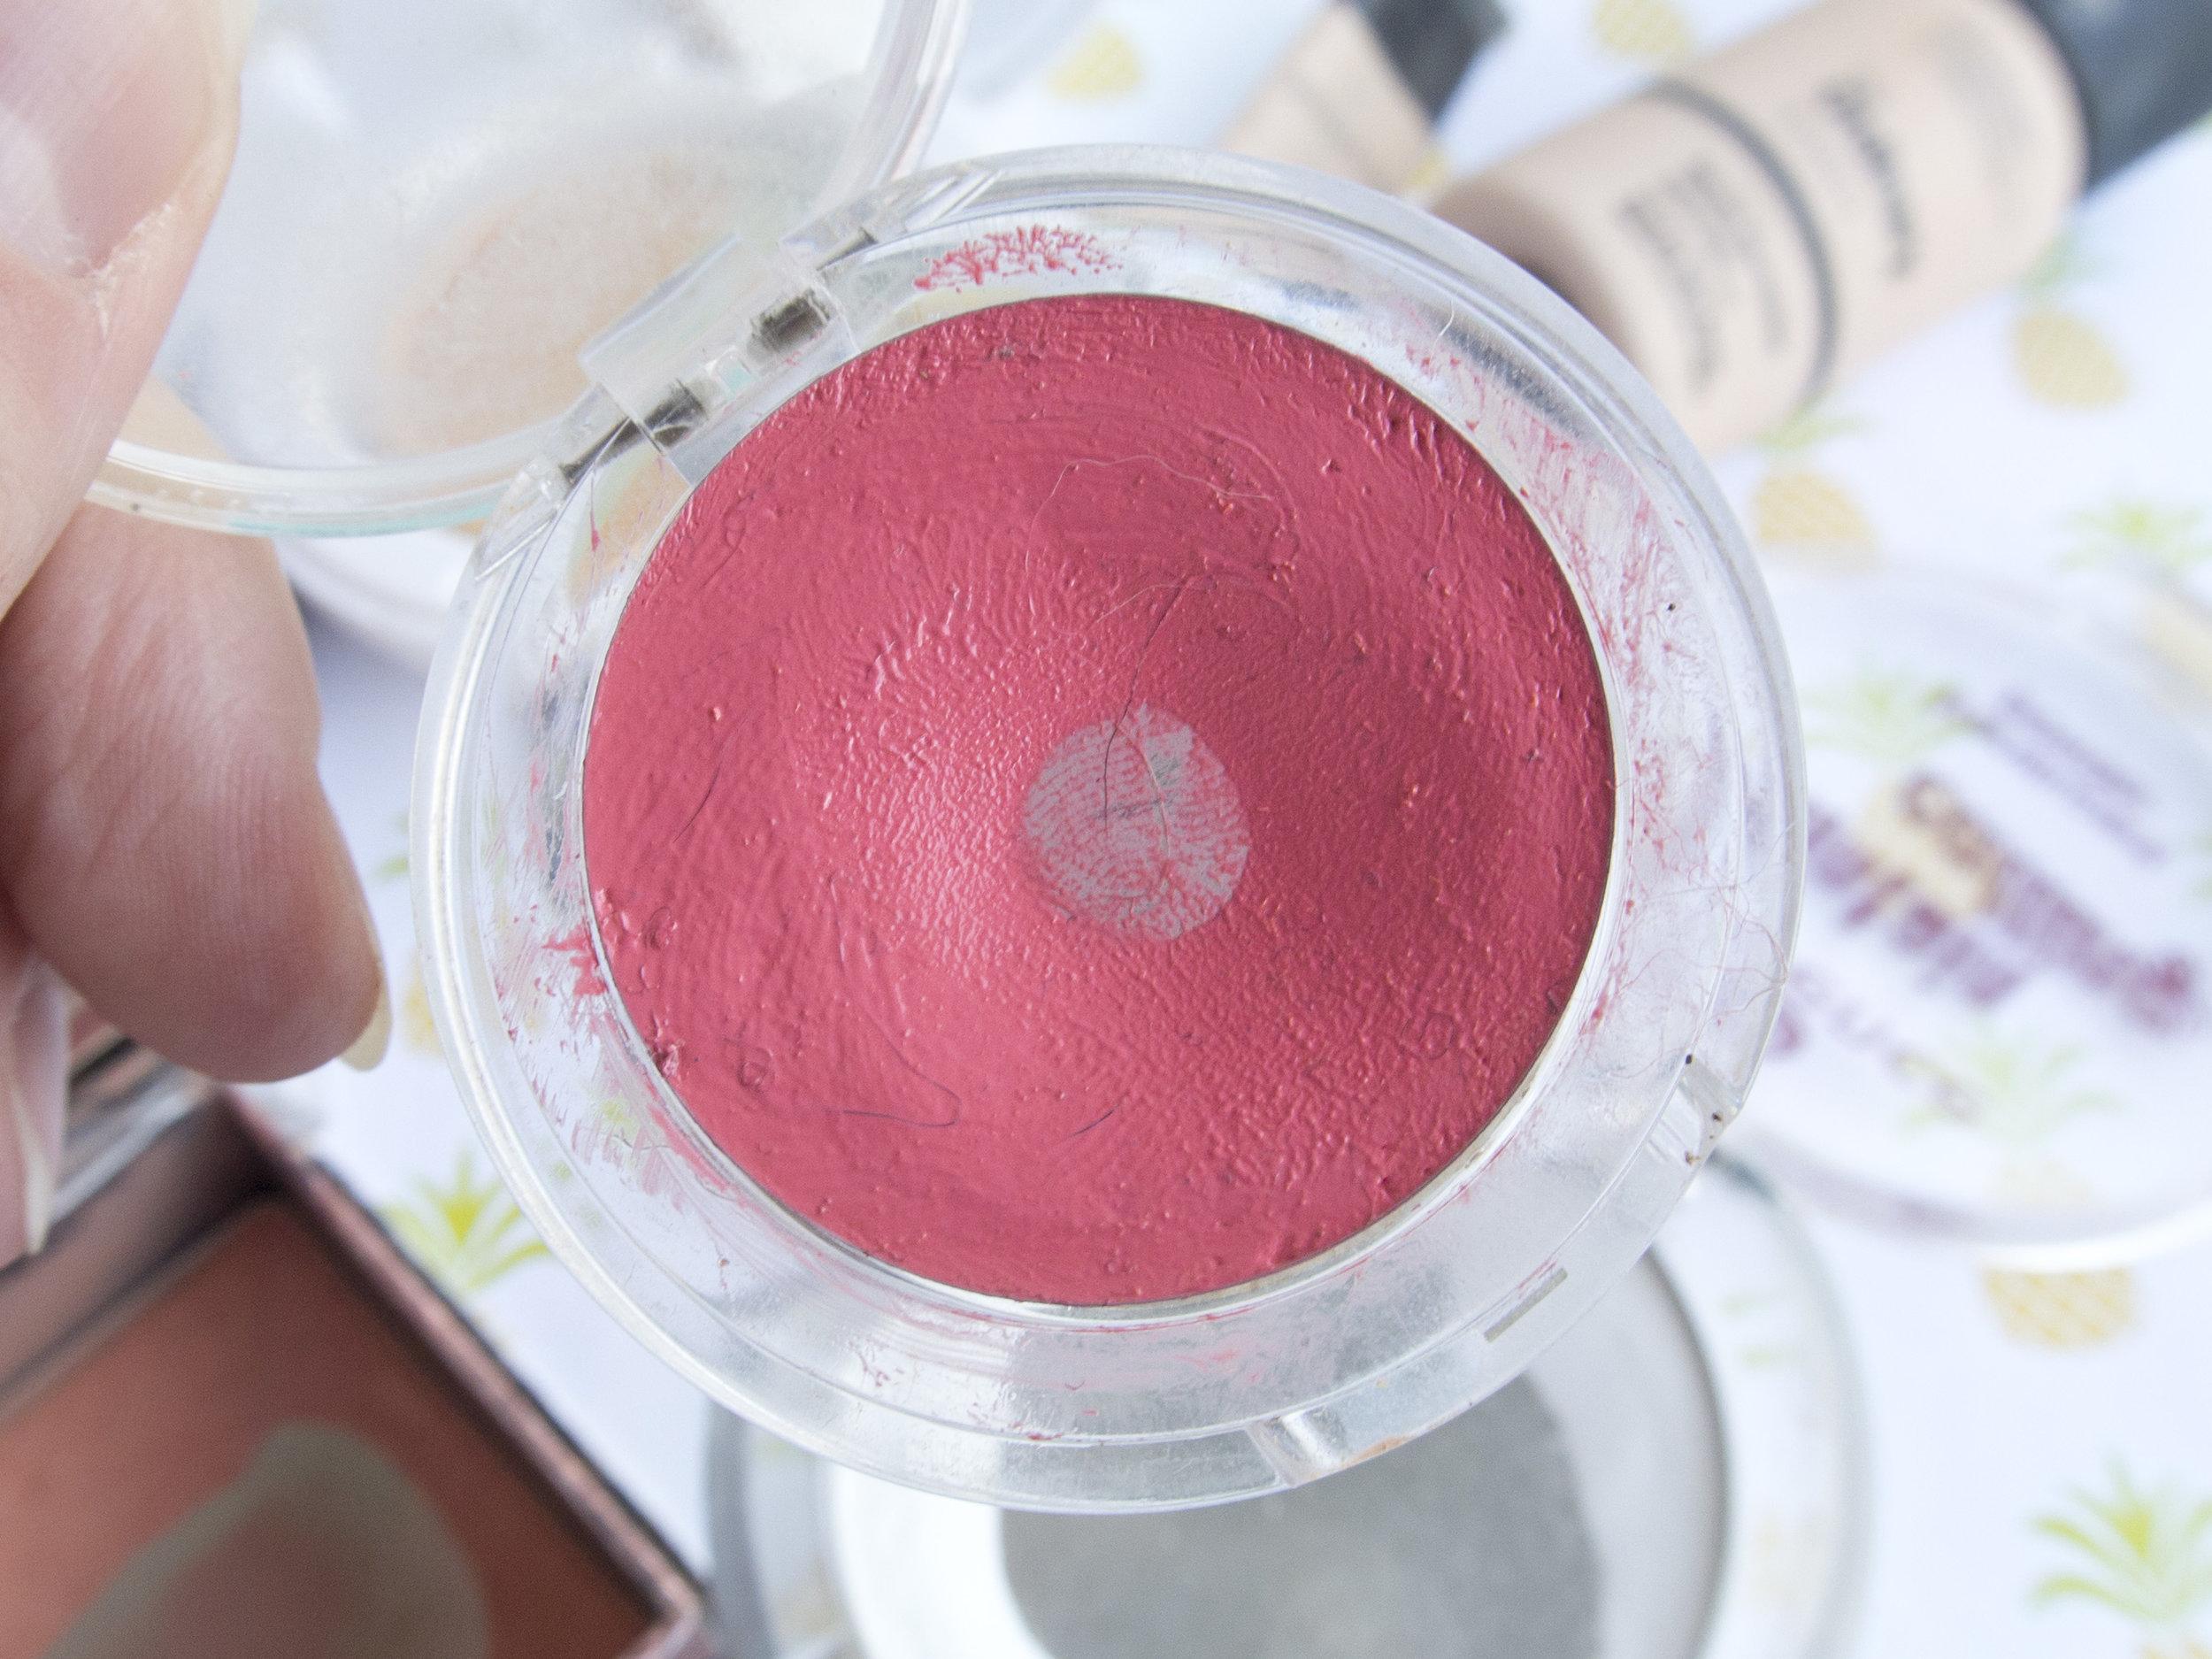 Essence Beauty on Tour Cream Blush